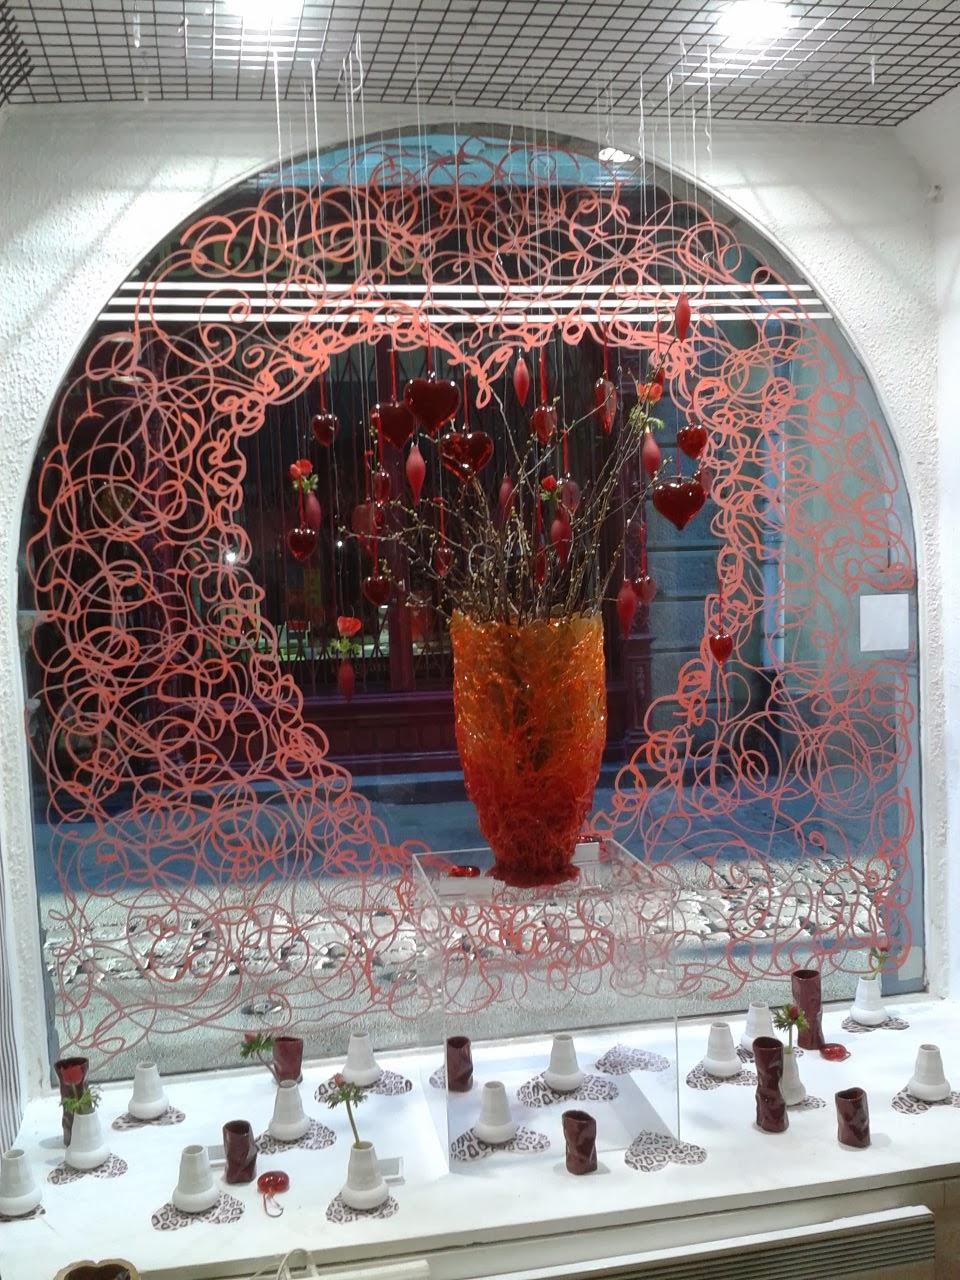 Home jasmin vitrine saint valentin 2014 - Deco vitrine saint valentin ...